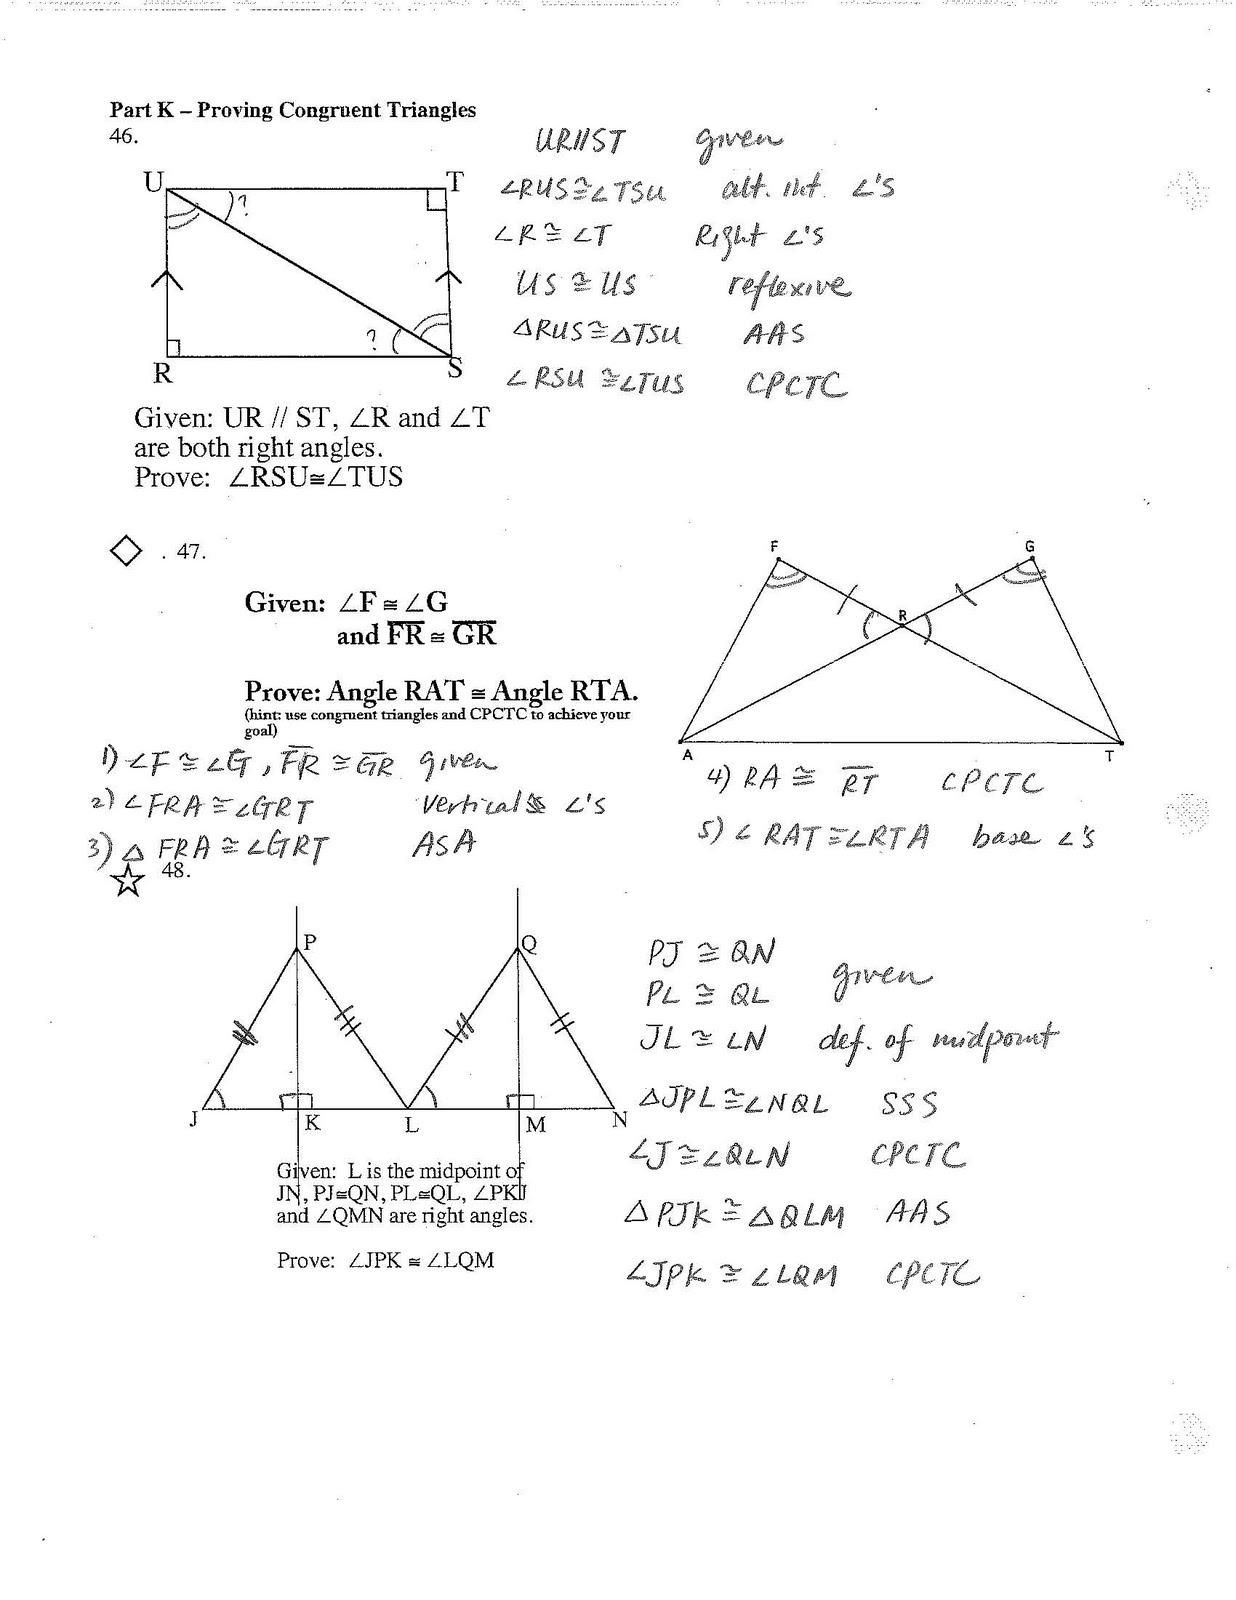 Jiazhen S Geometry Final Review Sheet Answers Are Here